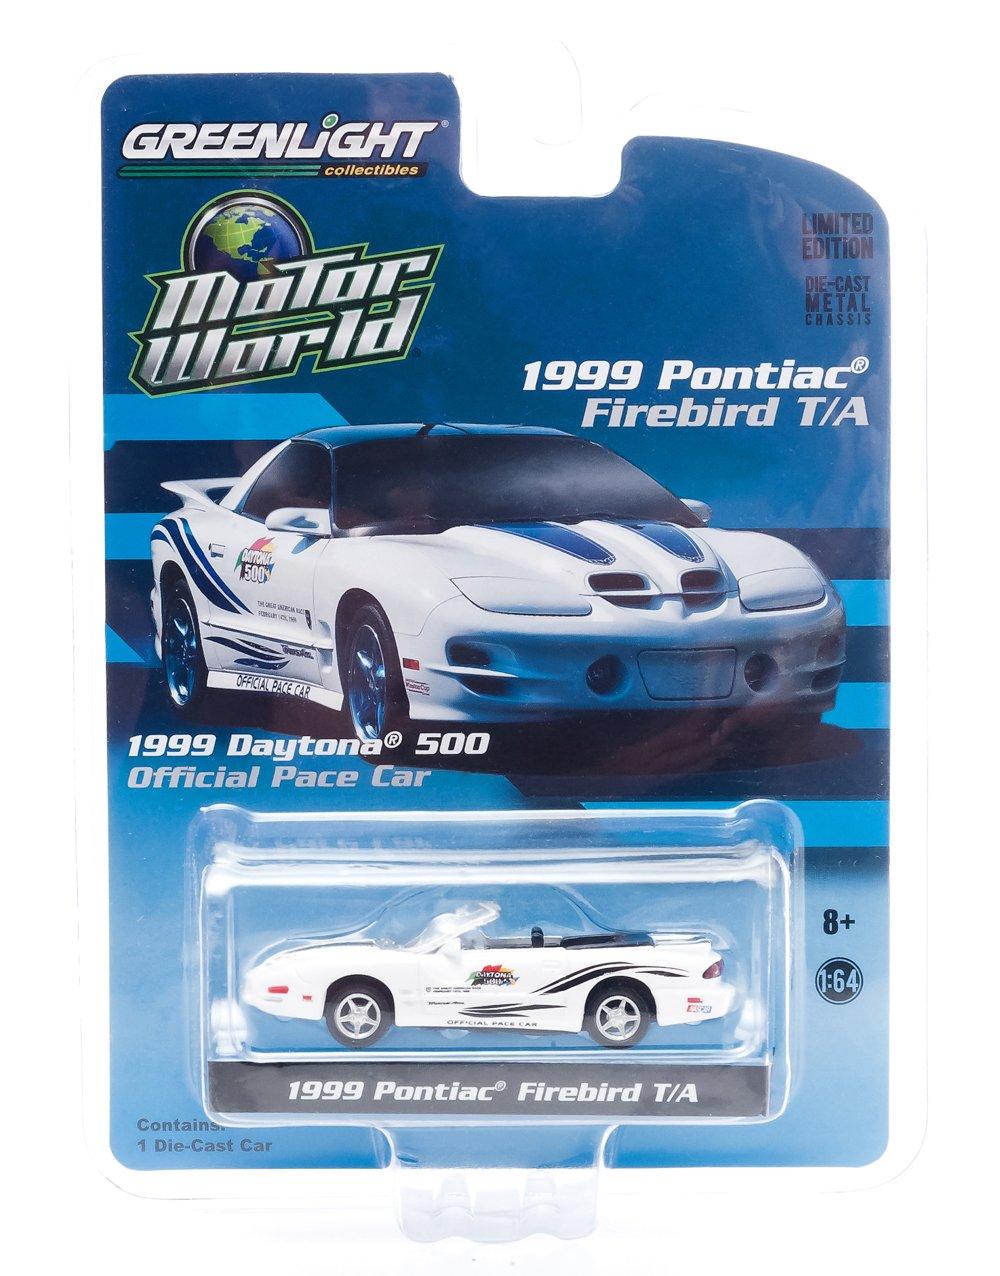 GrünLight 1999 Pontiac Firebird T/A Daytona 500 Pace Car (1:64 (1:64 (1:64 Scale) 9b0420